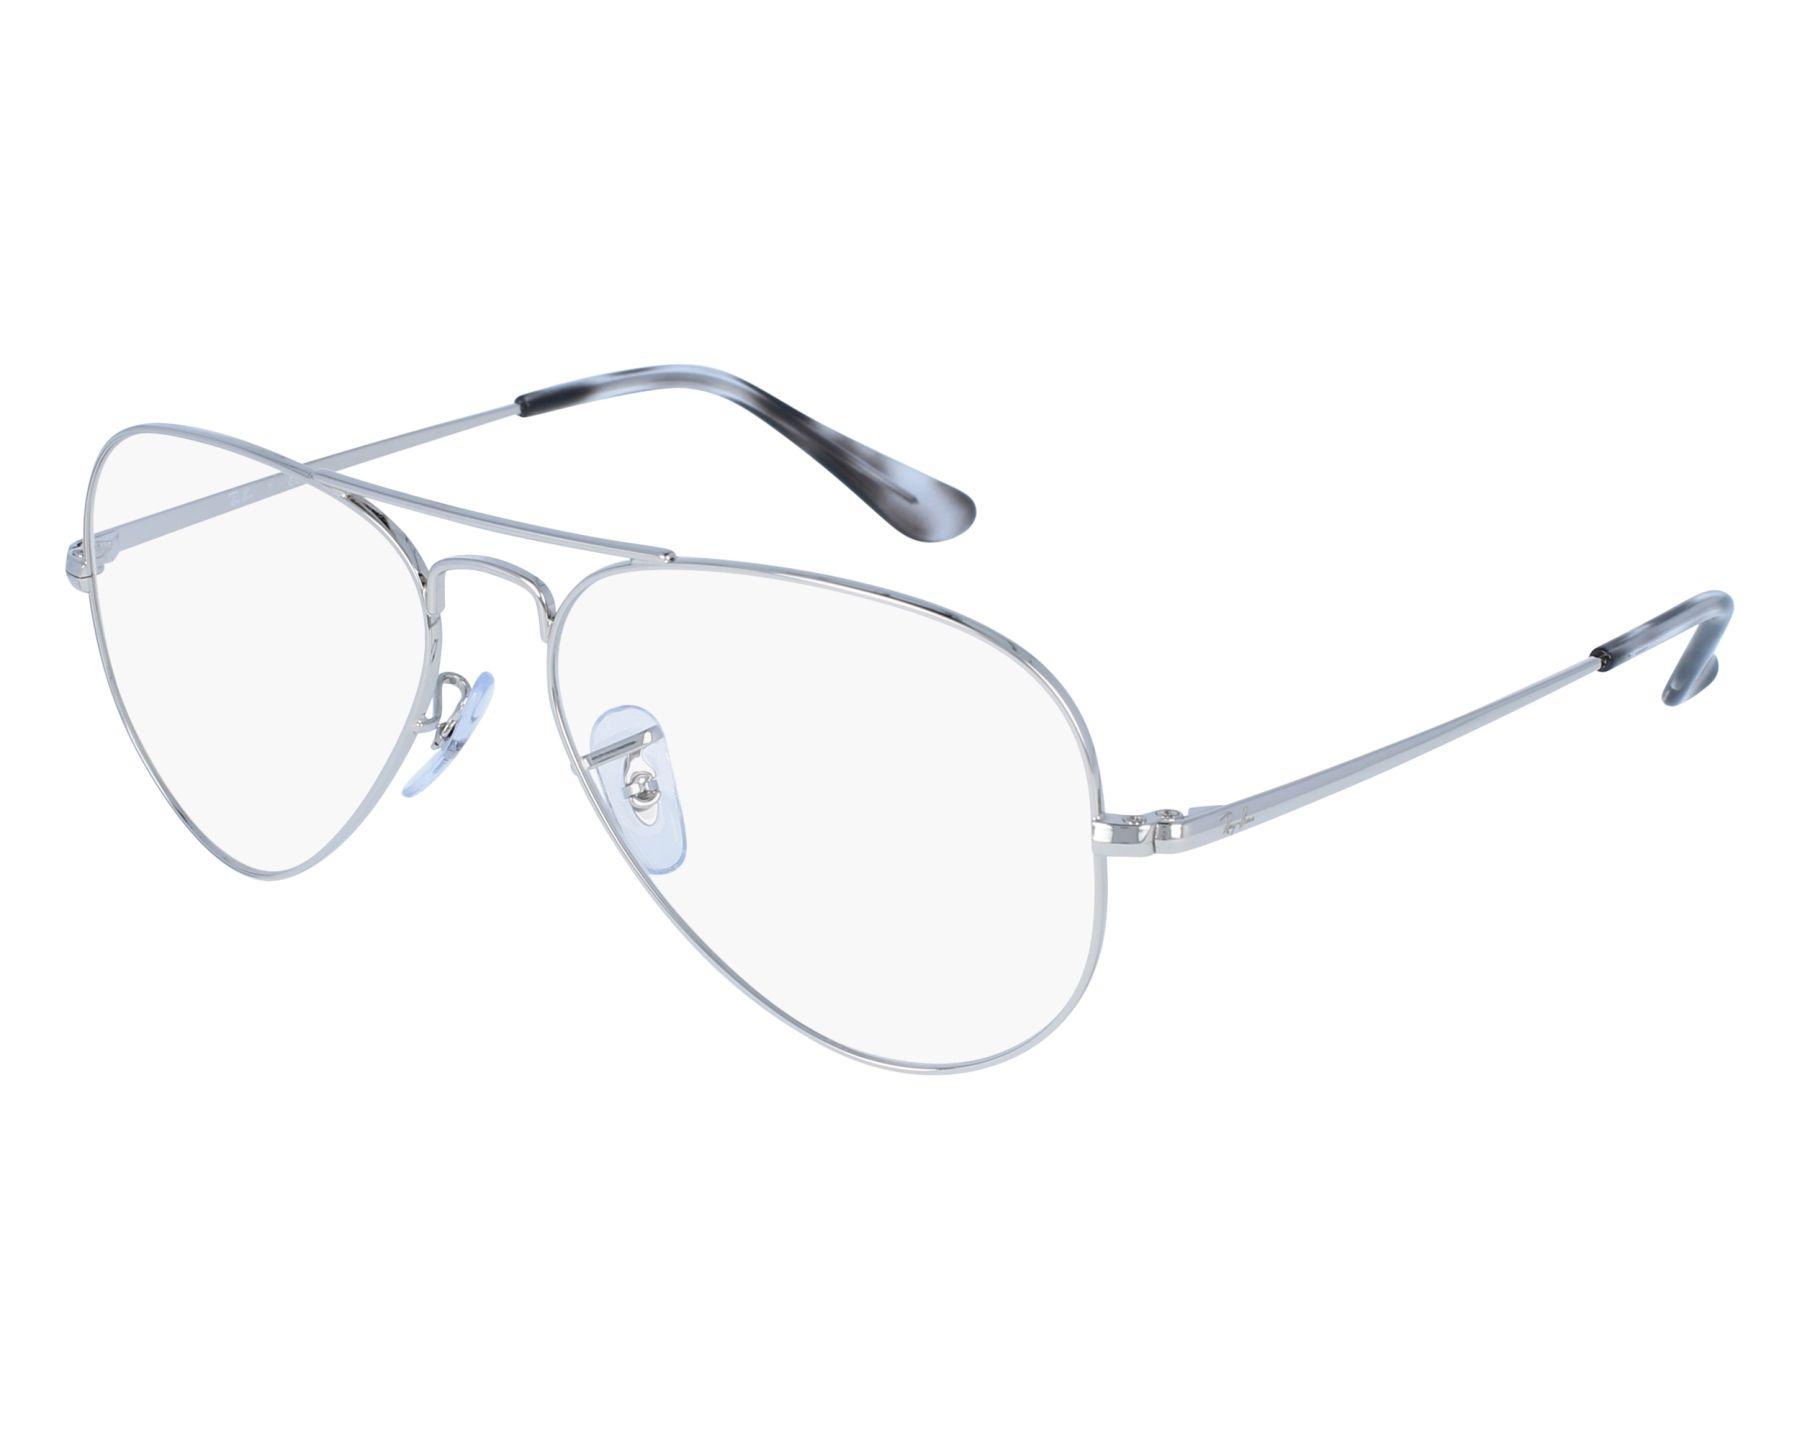 Ray Ban Eyeglasses Rx Silver